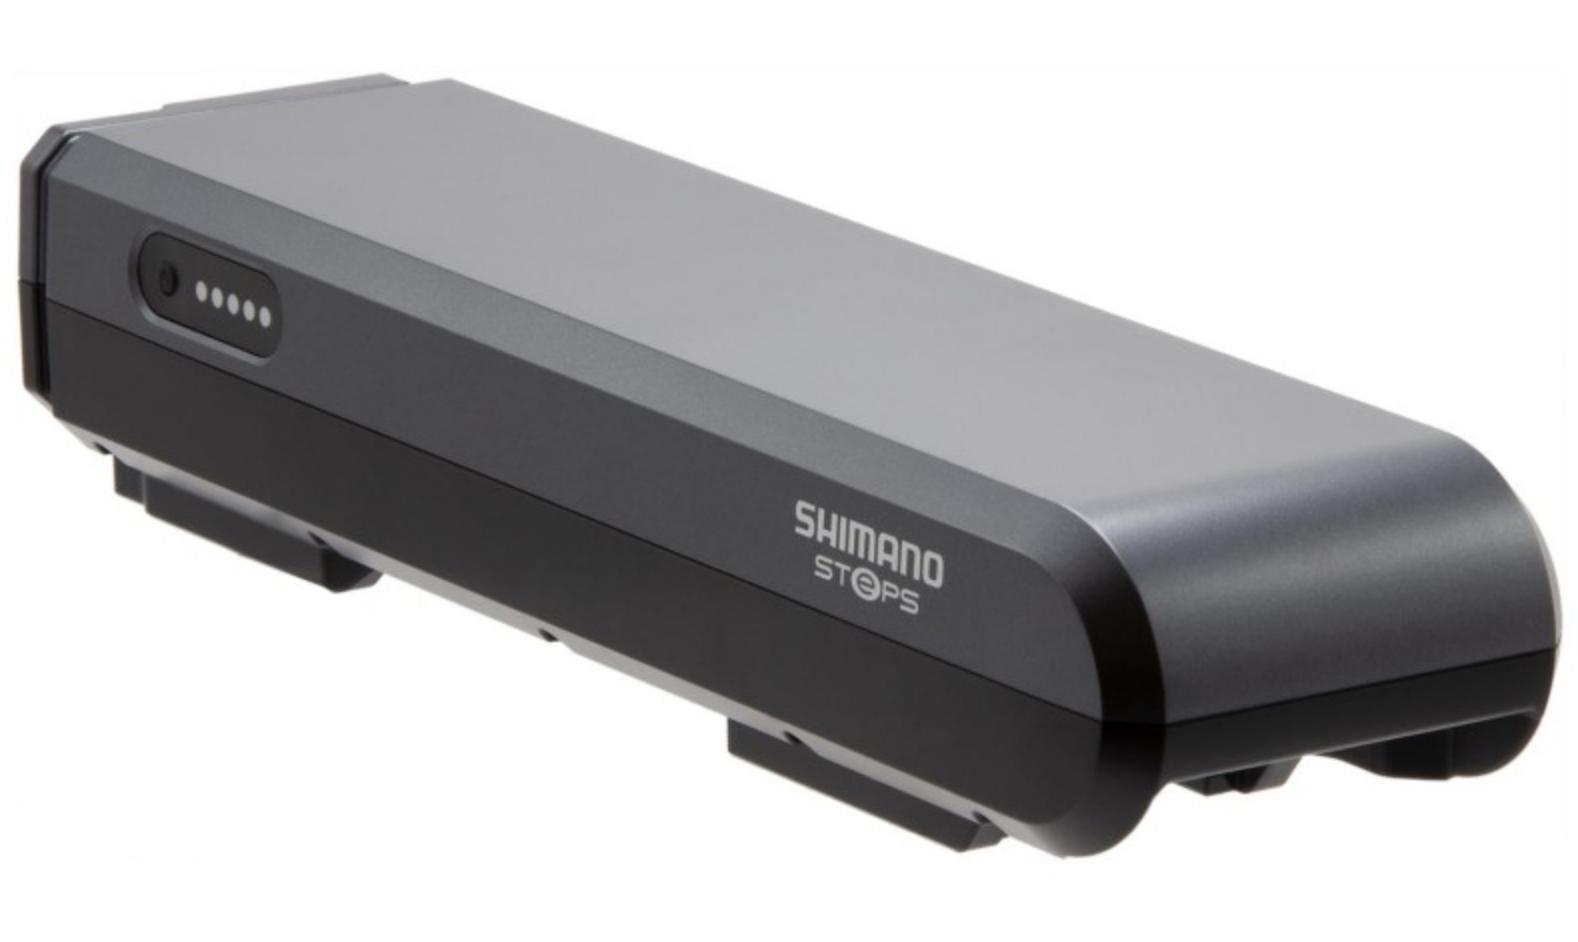 Elektrische fiets accu revisie Shimano Steps BT-E6001 36V